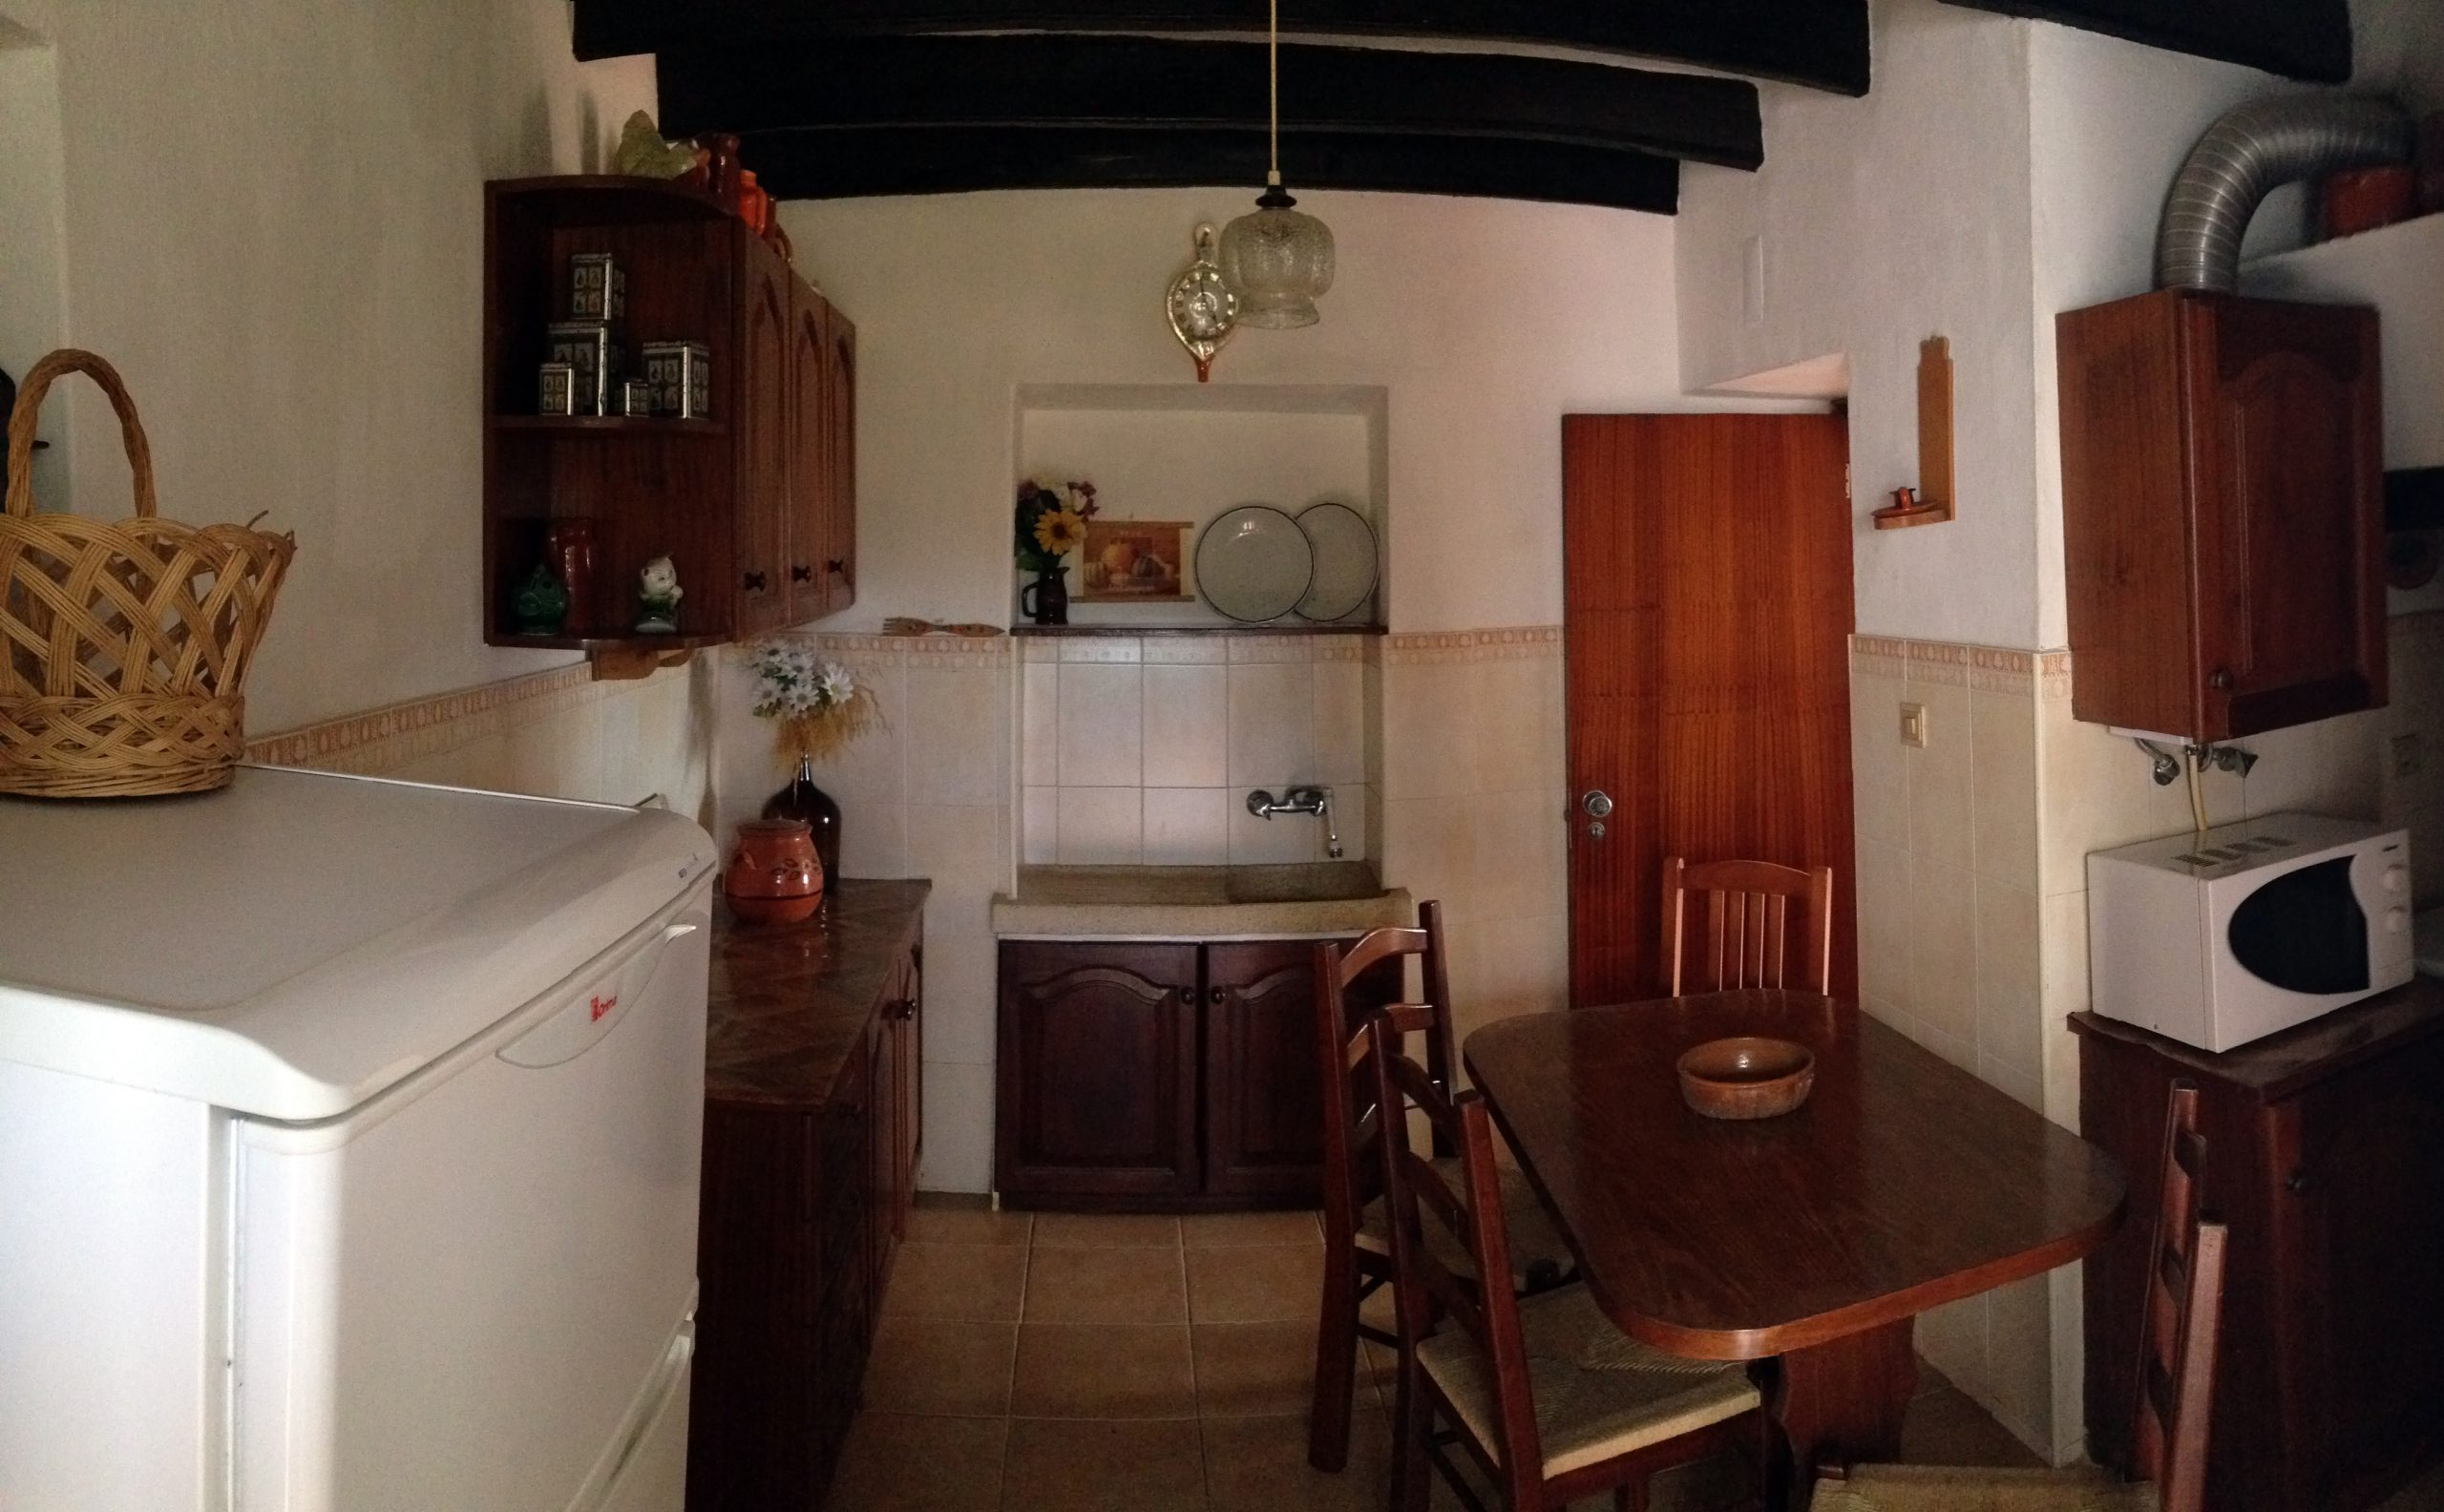 Location appartements et villas de vacance, casa de campo à Olhão, Portugal Algarve, REF_IMG_16889_16893